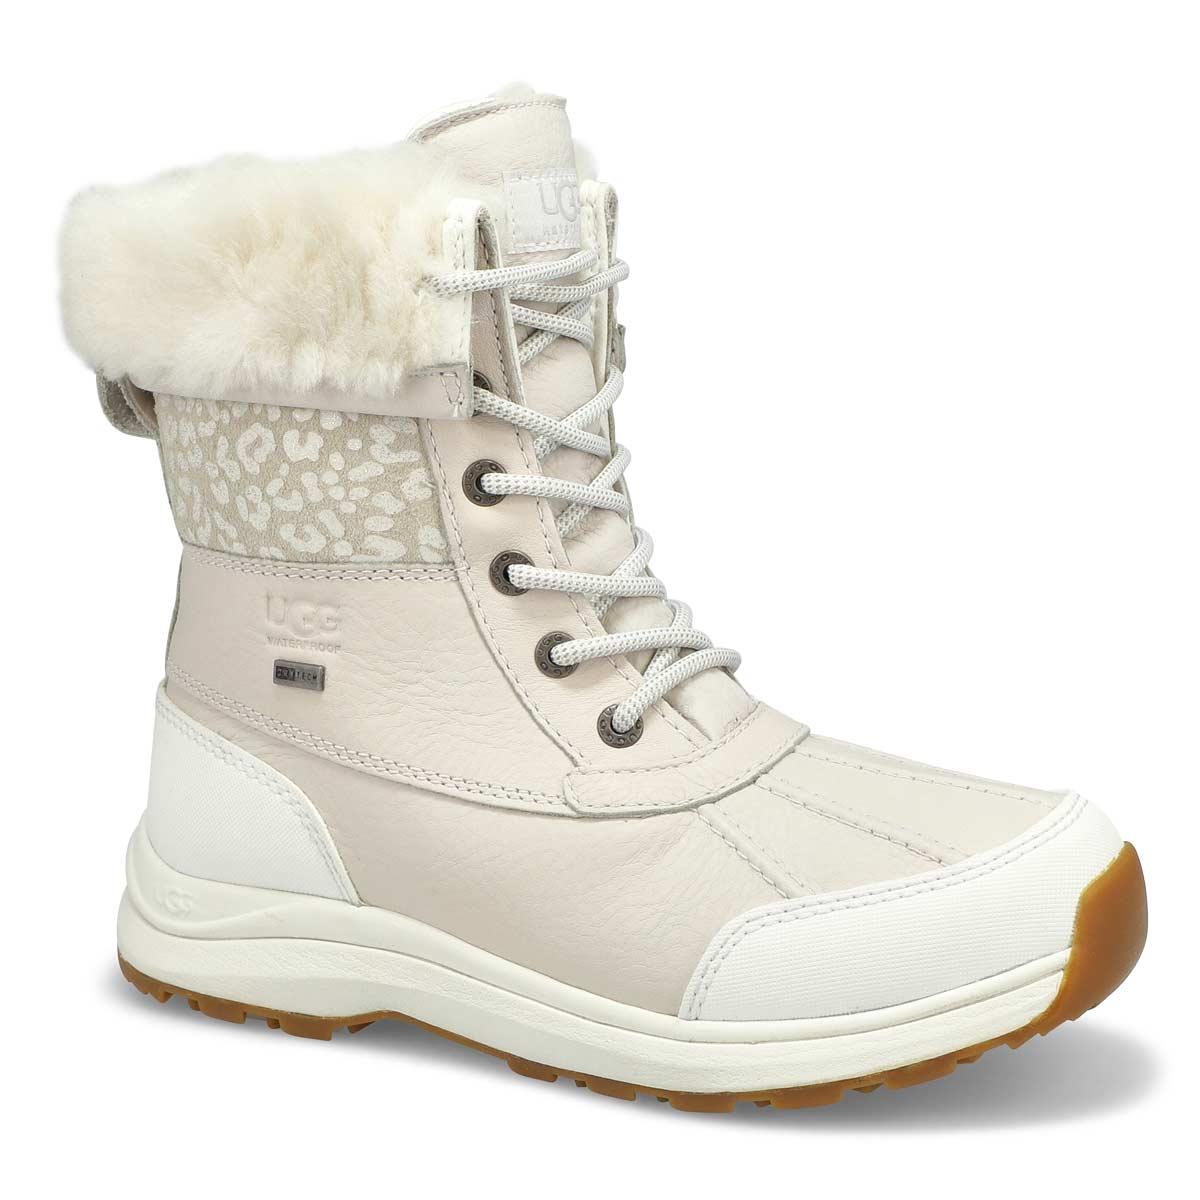 Bottes ADIRONDACKIII, léopard/neige blanc, femmes